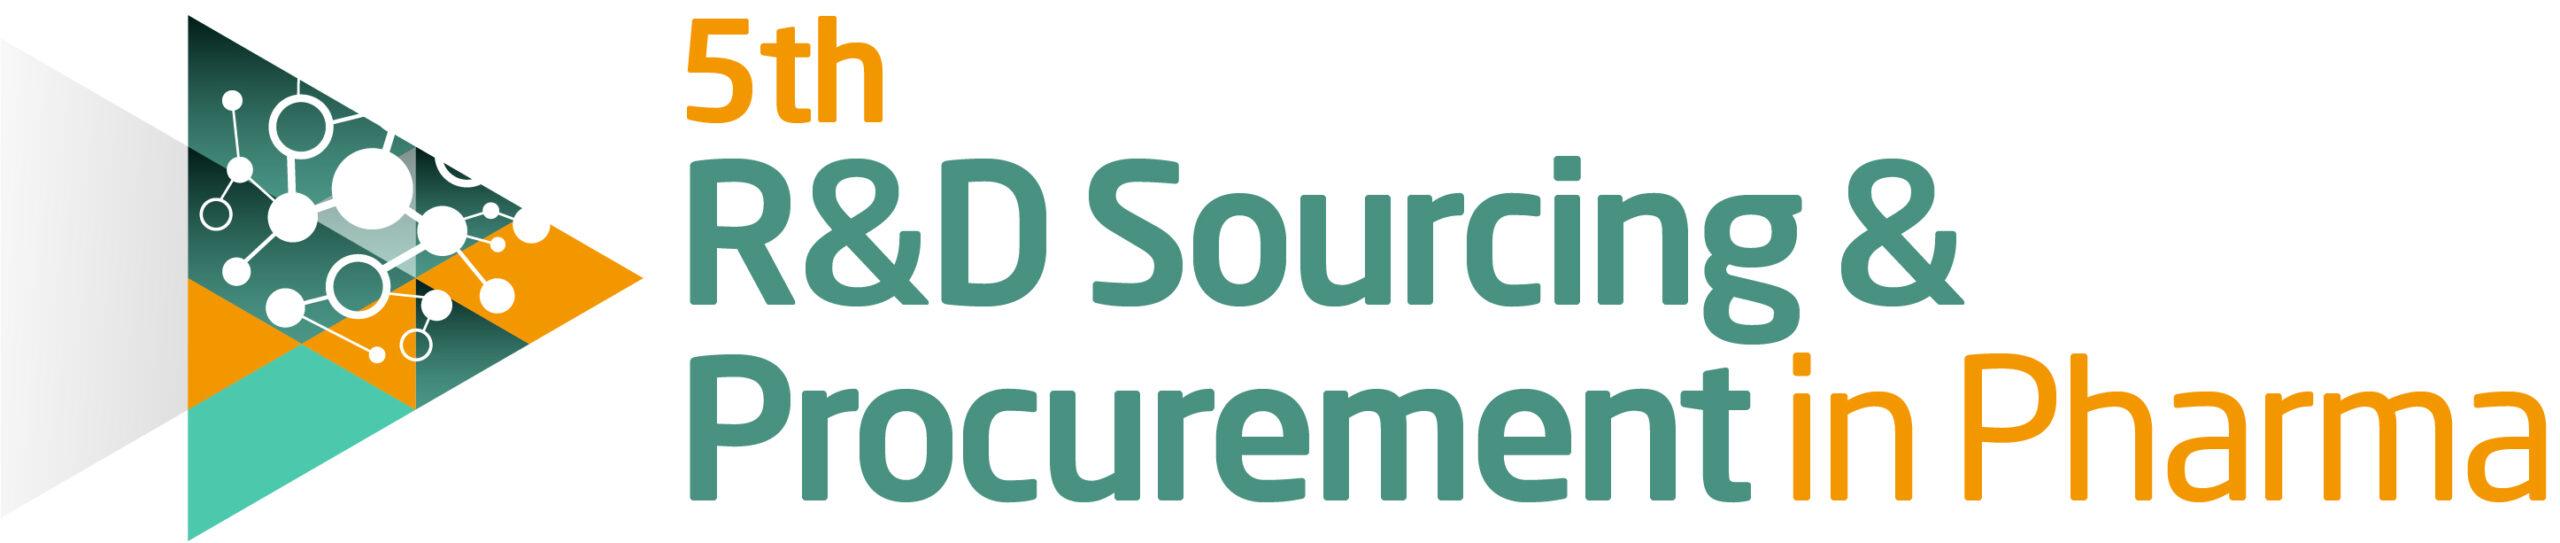 HW190520 R&D Sourcing Logo 2021